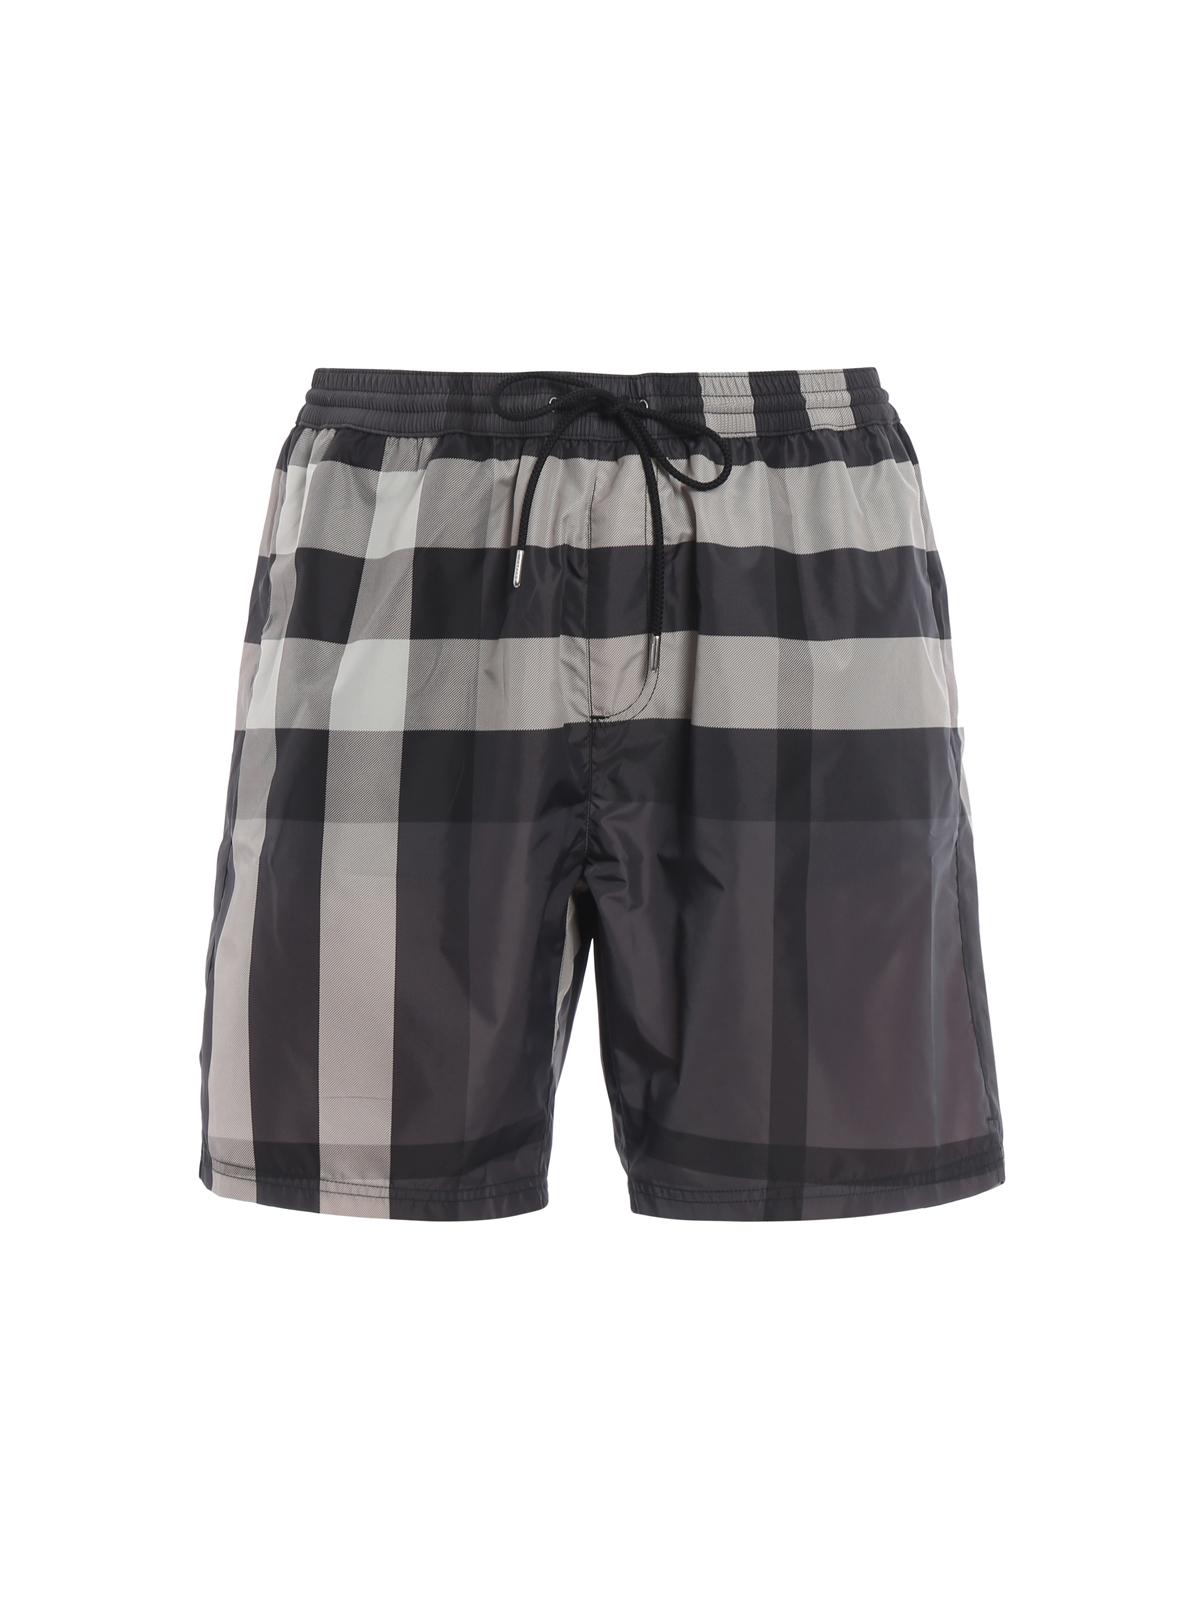 77ed5acca0 BURBERRY: Swim shorts & swimming trunks - Check pattern swimming shorts